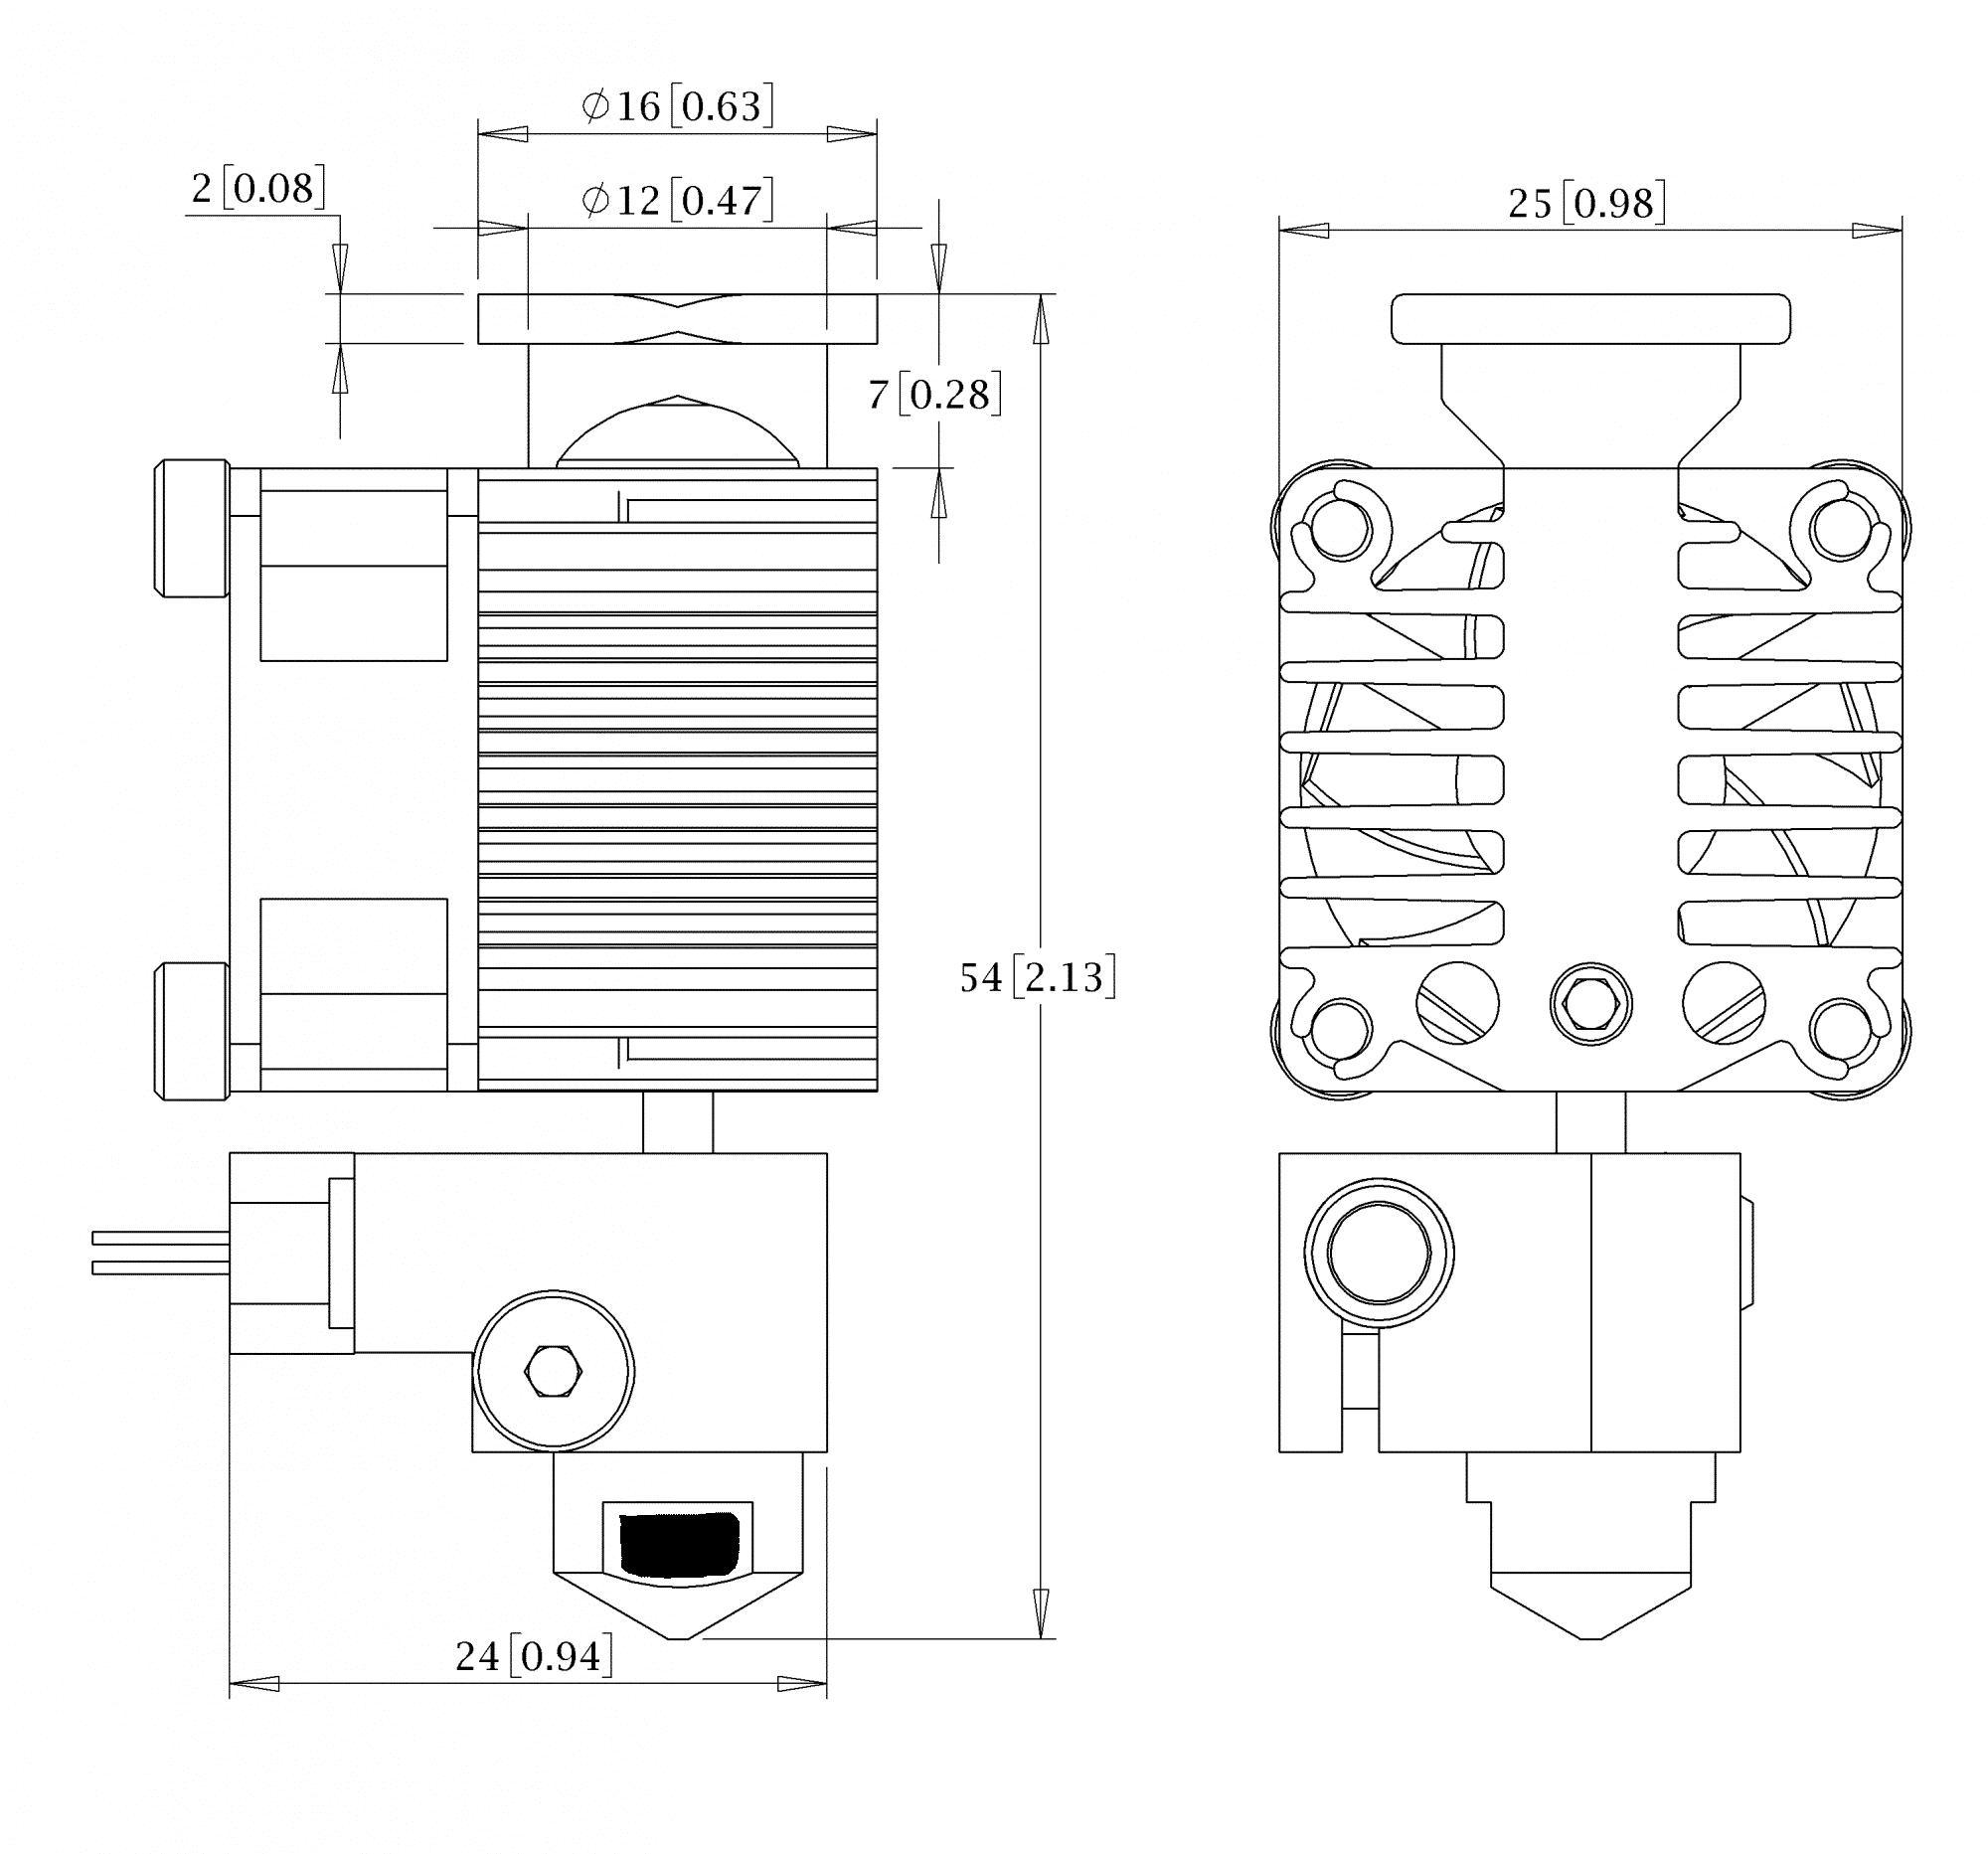 DyzEnd-X Drawings